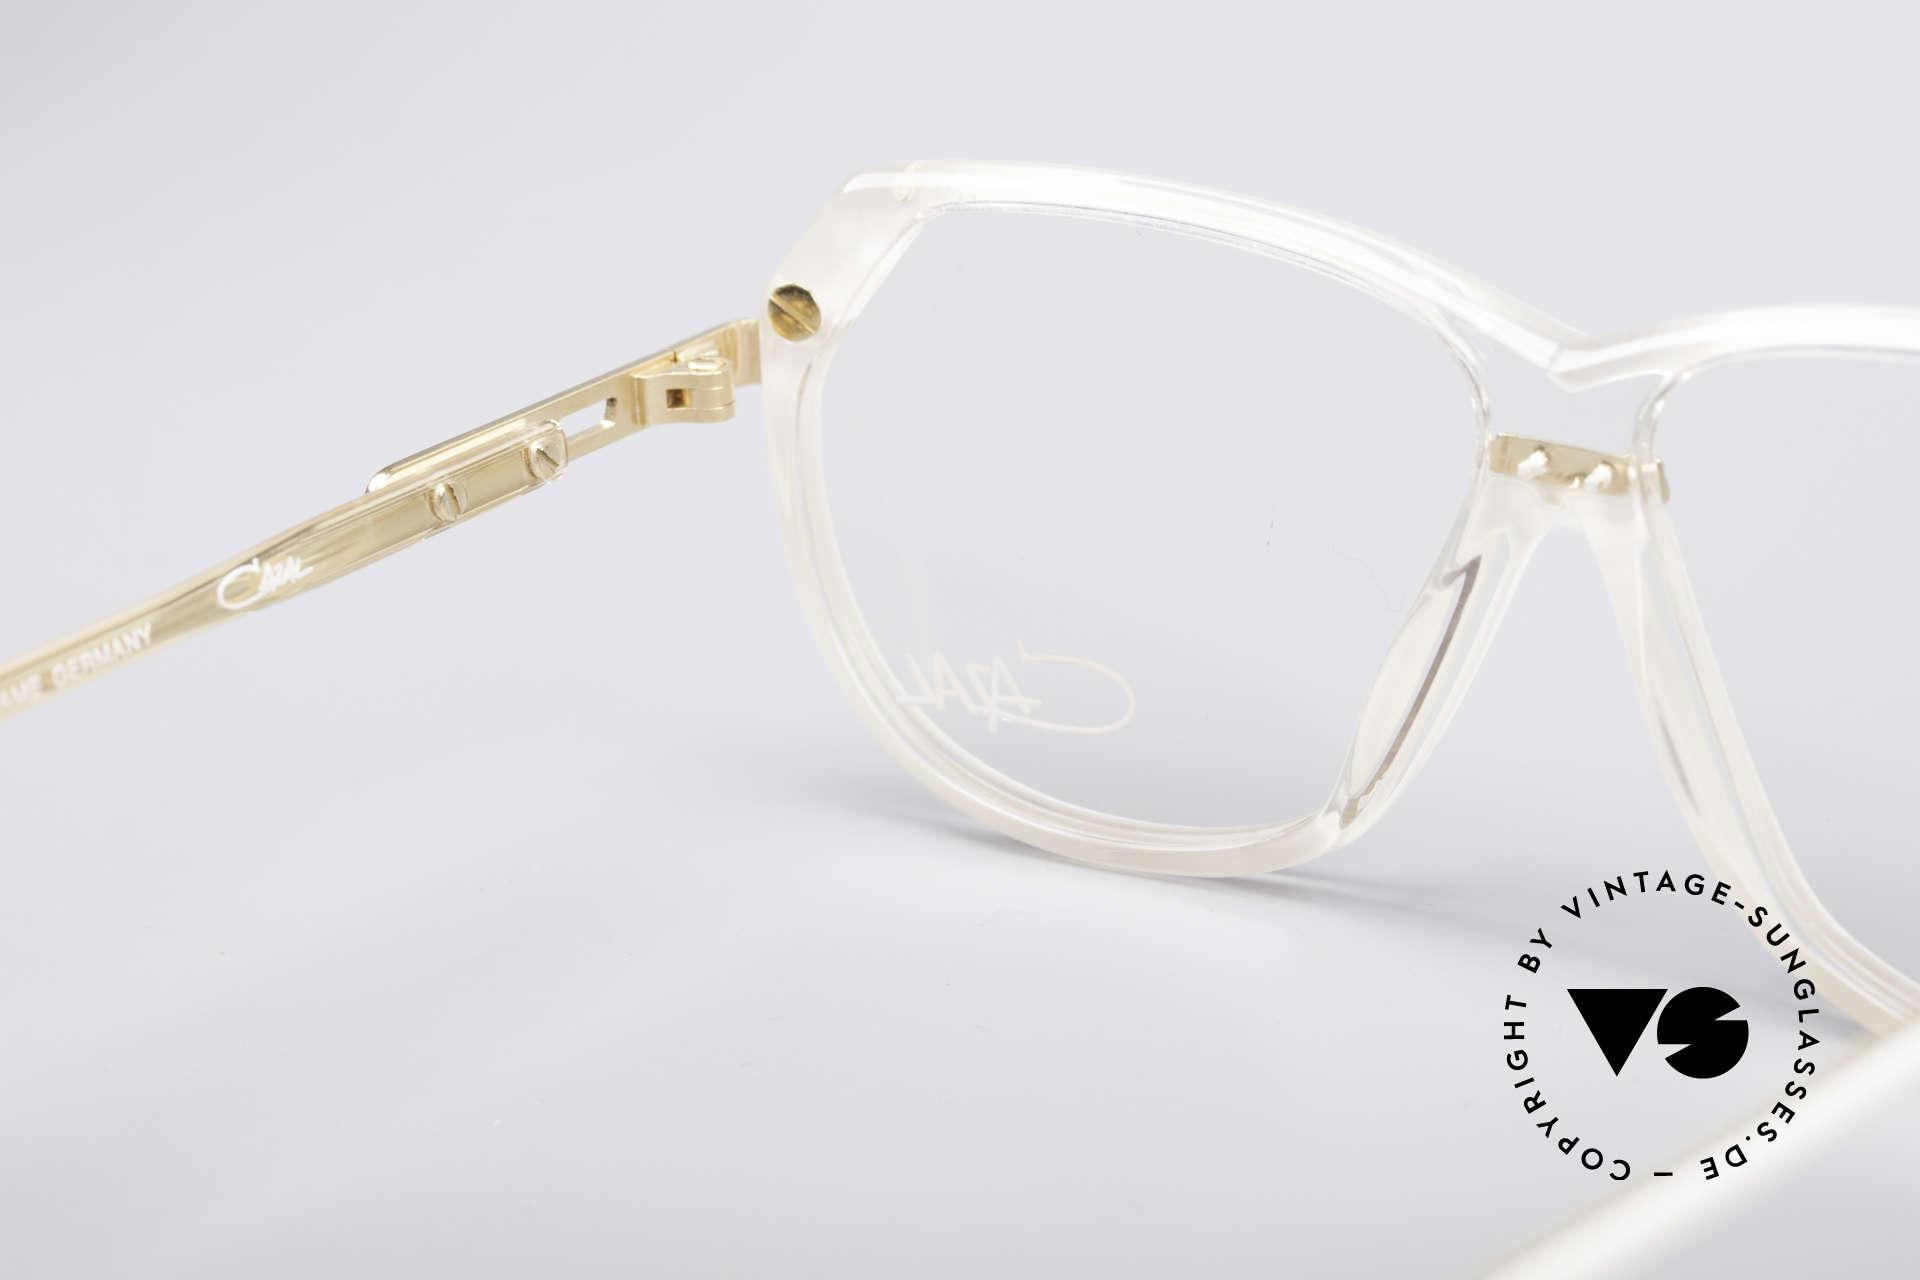 Cazal 339 90's Vintage Designer Specs, Size: small, Made for Women